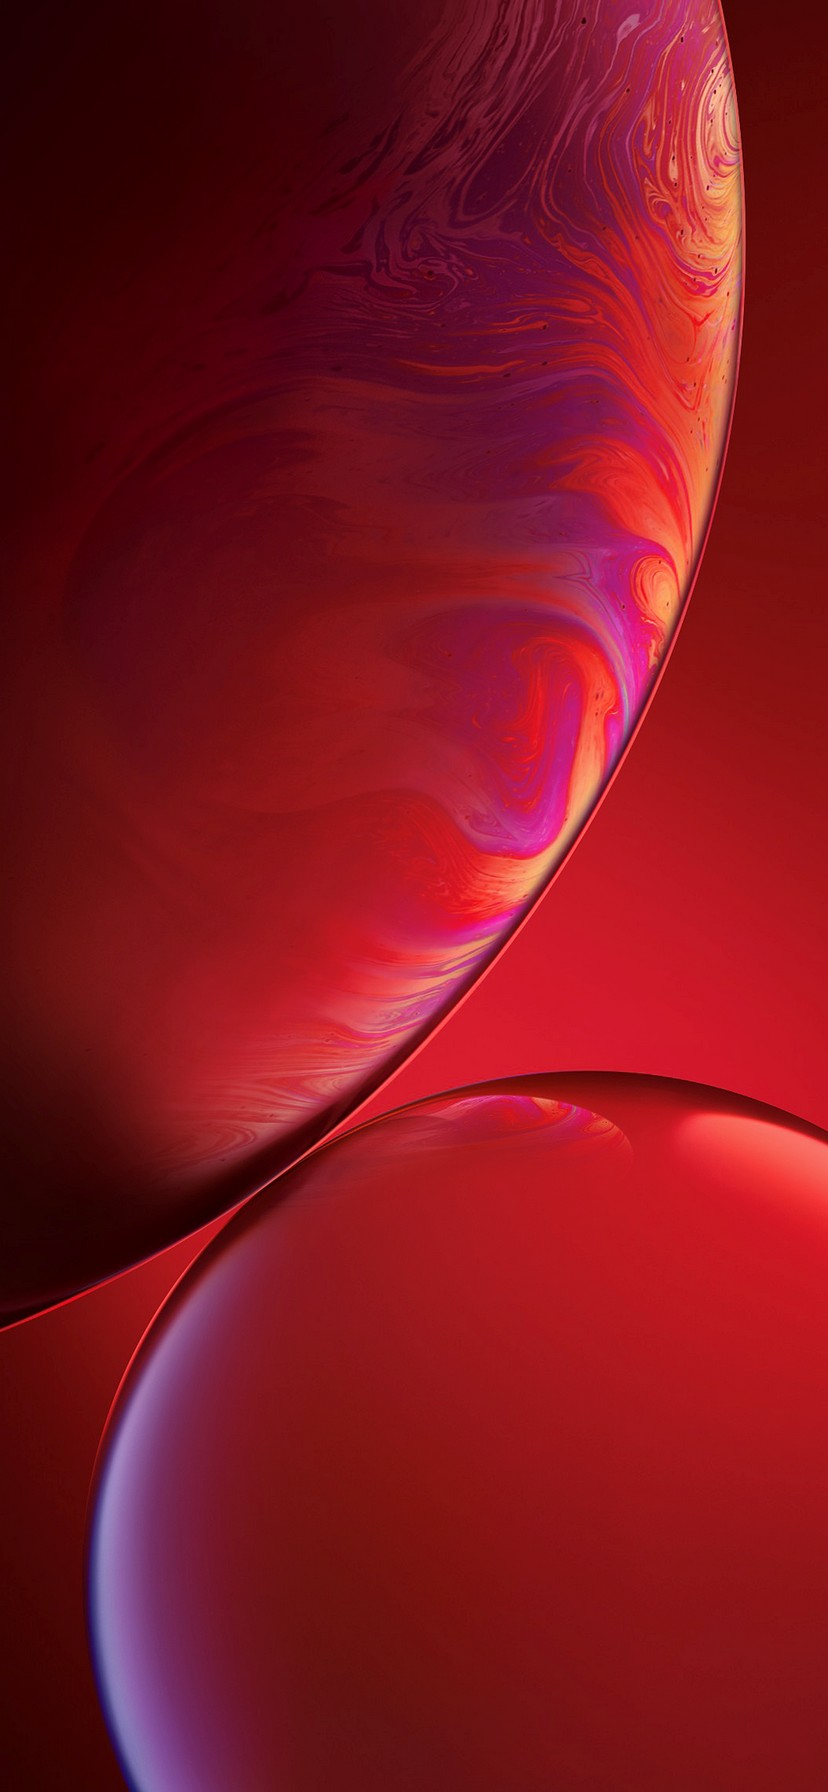 Iphone Xr Wallpaper Red : iphone, wallpaper, Iphone, Wallpaper, High-resolution, Pixel, 828x1792, Teahub.io